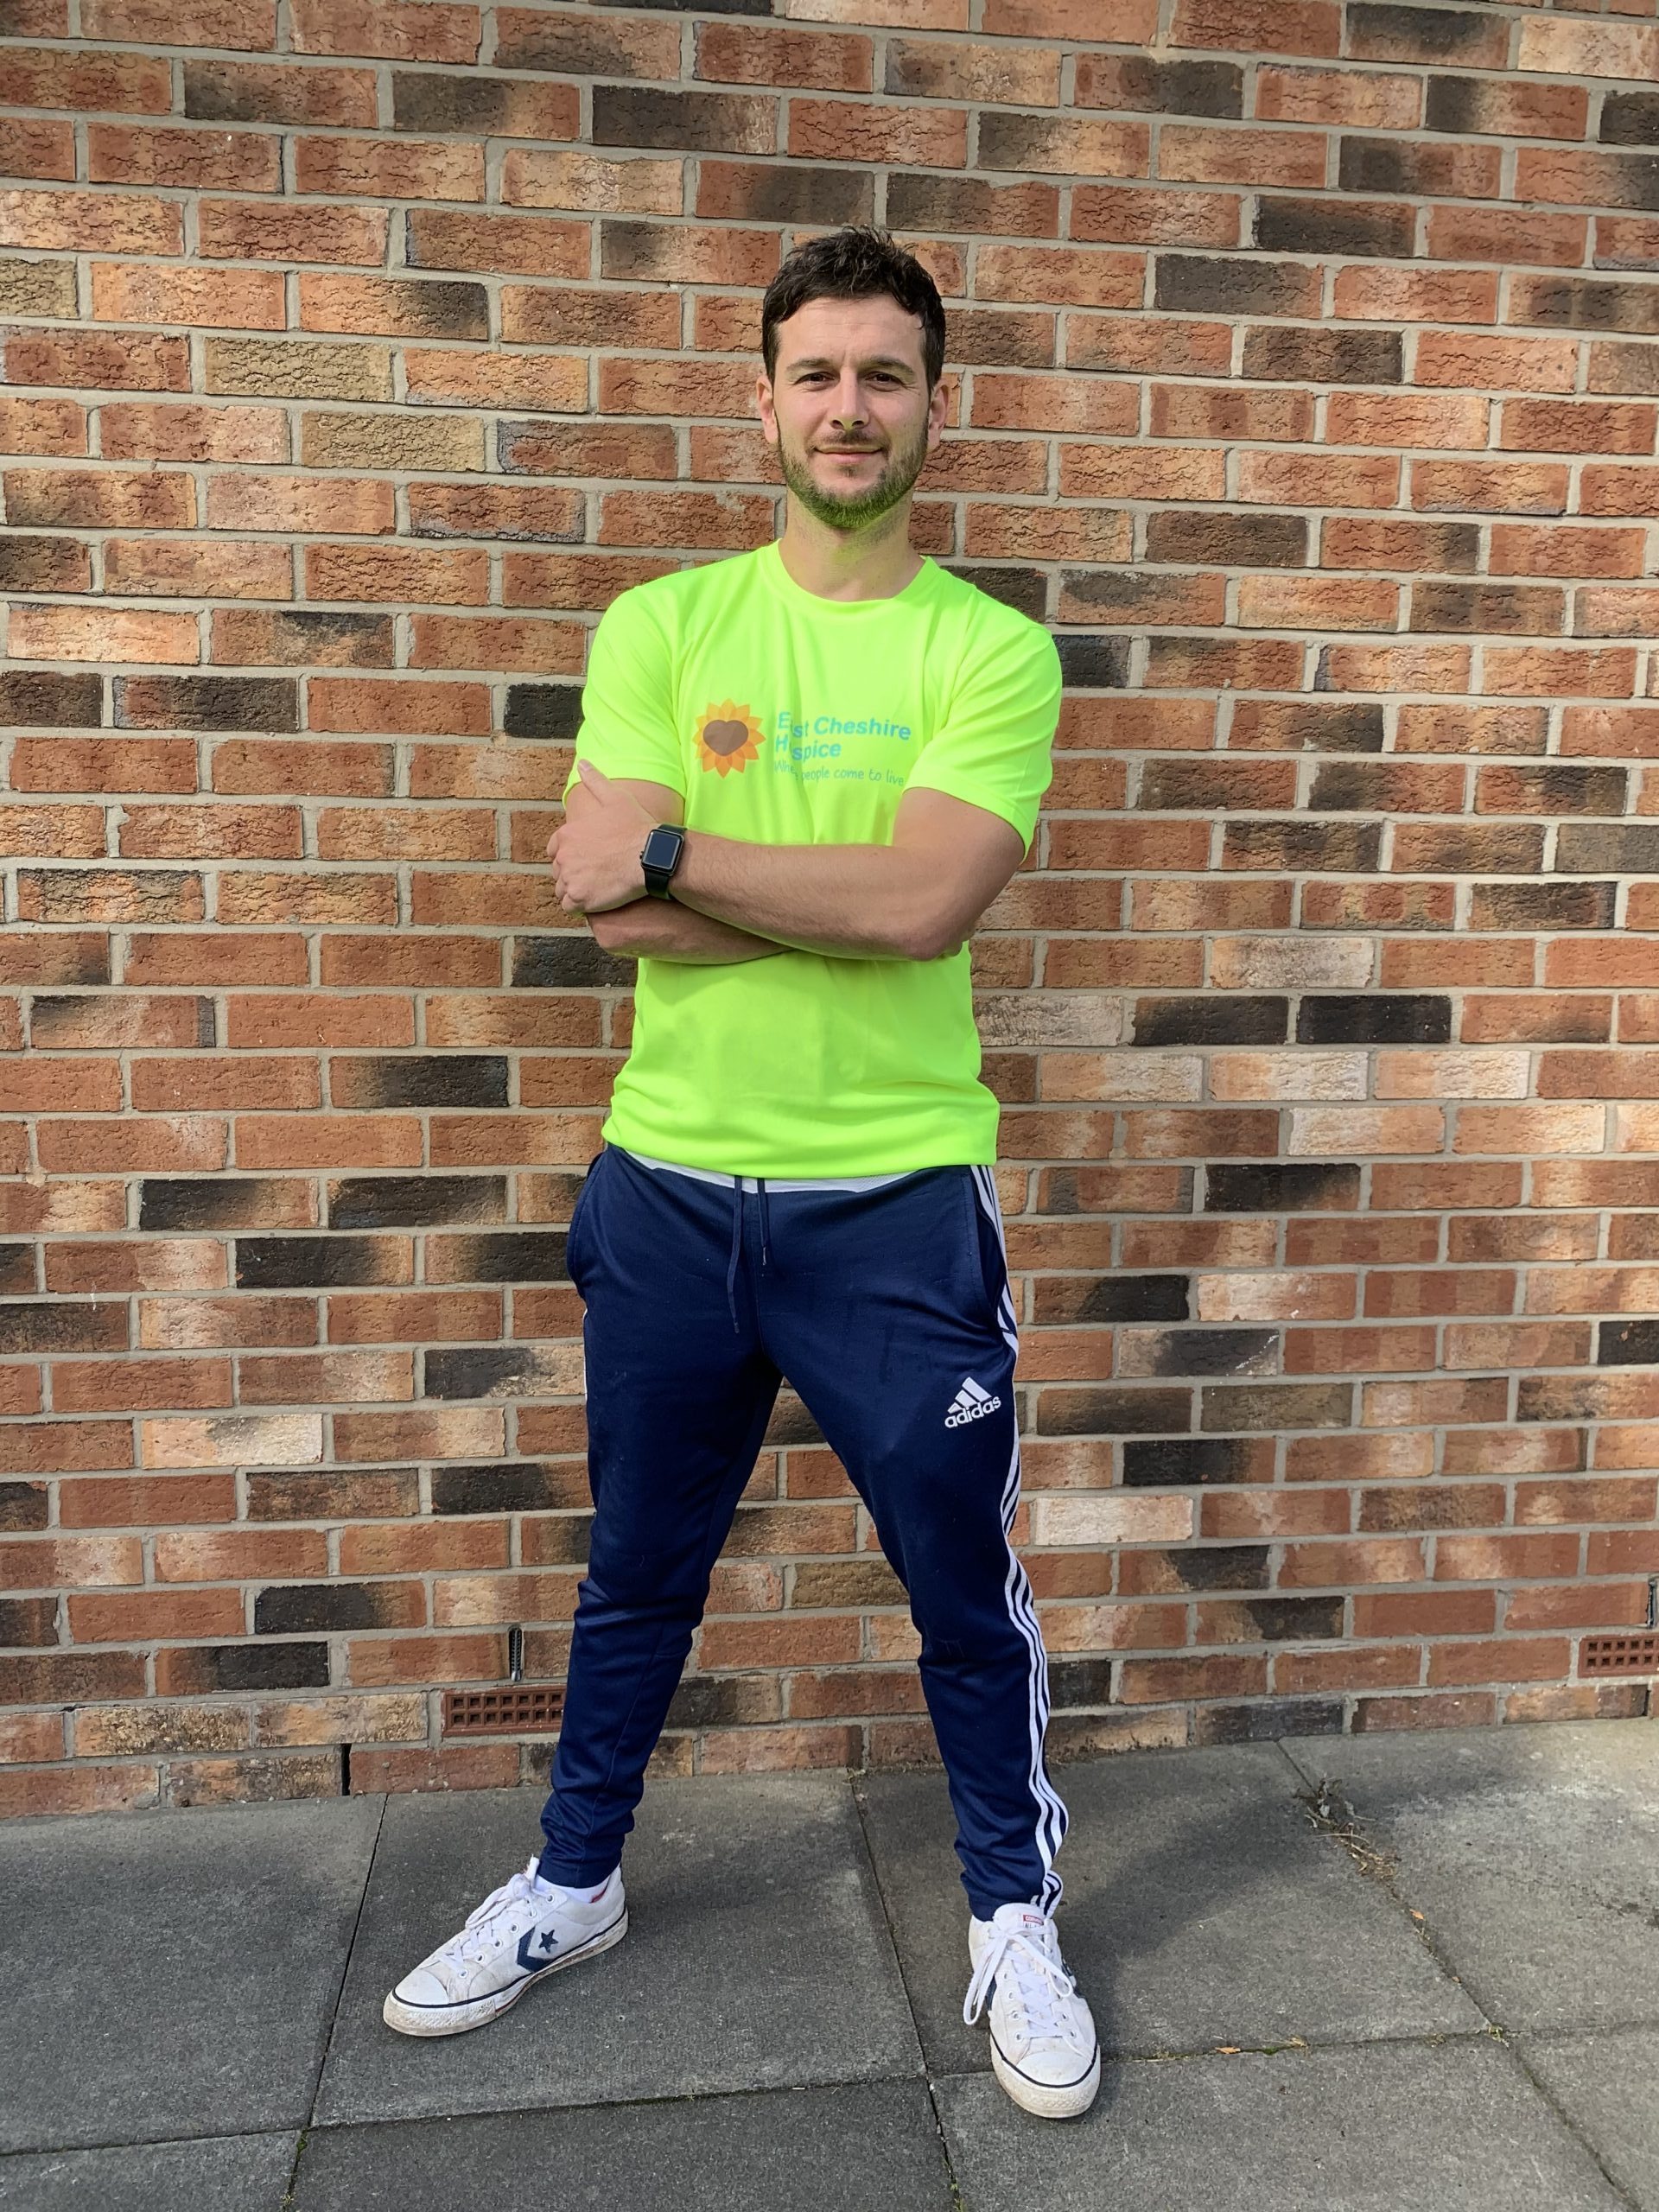 Dan Proctor's Mega Marathon